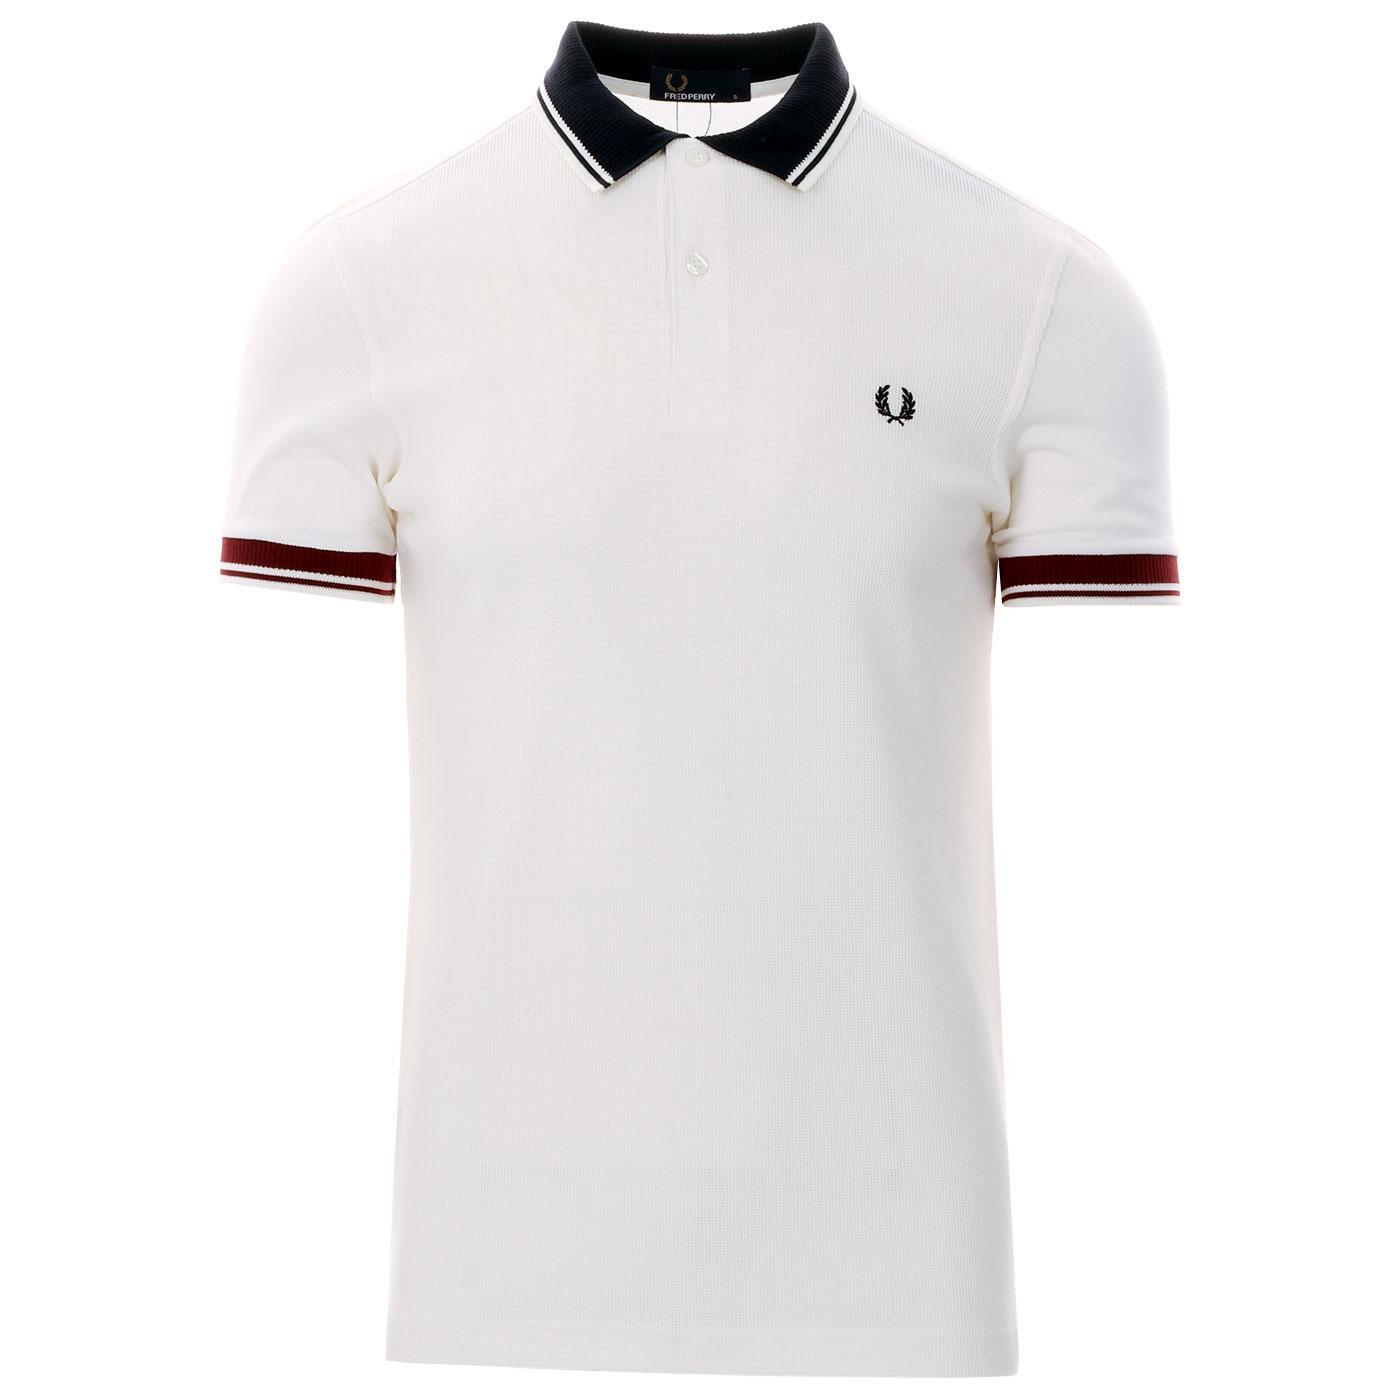 FRED PERRY Men's Ribbed Trim Pique Polo Shirt SW